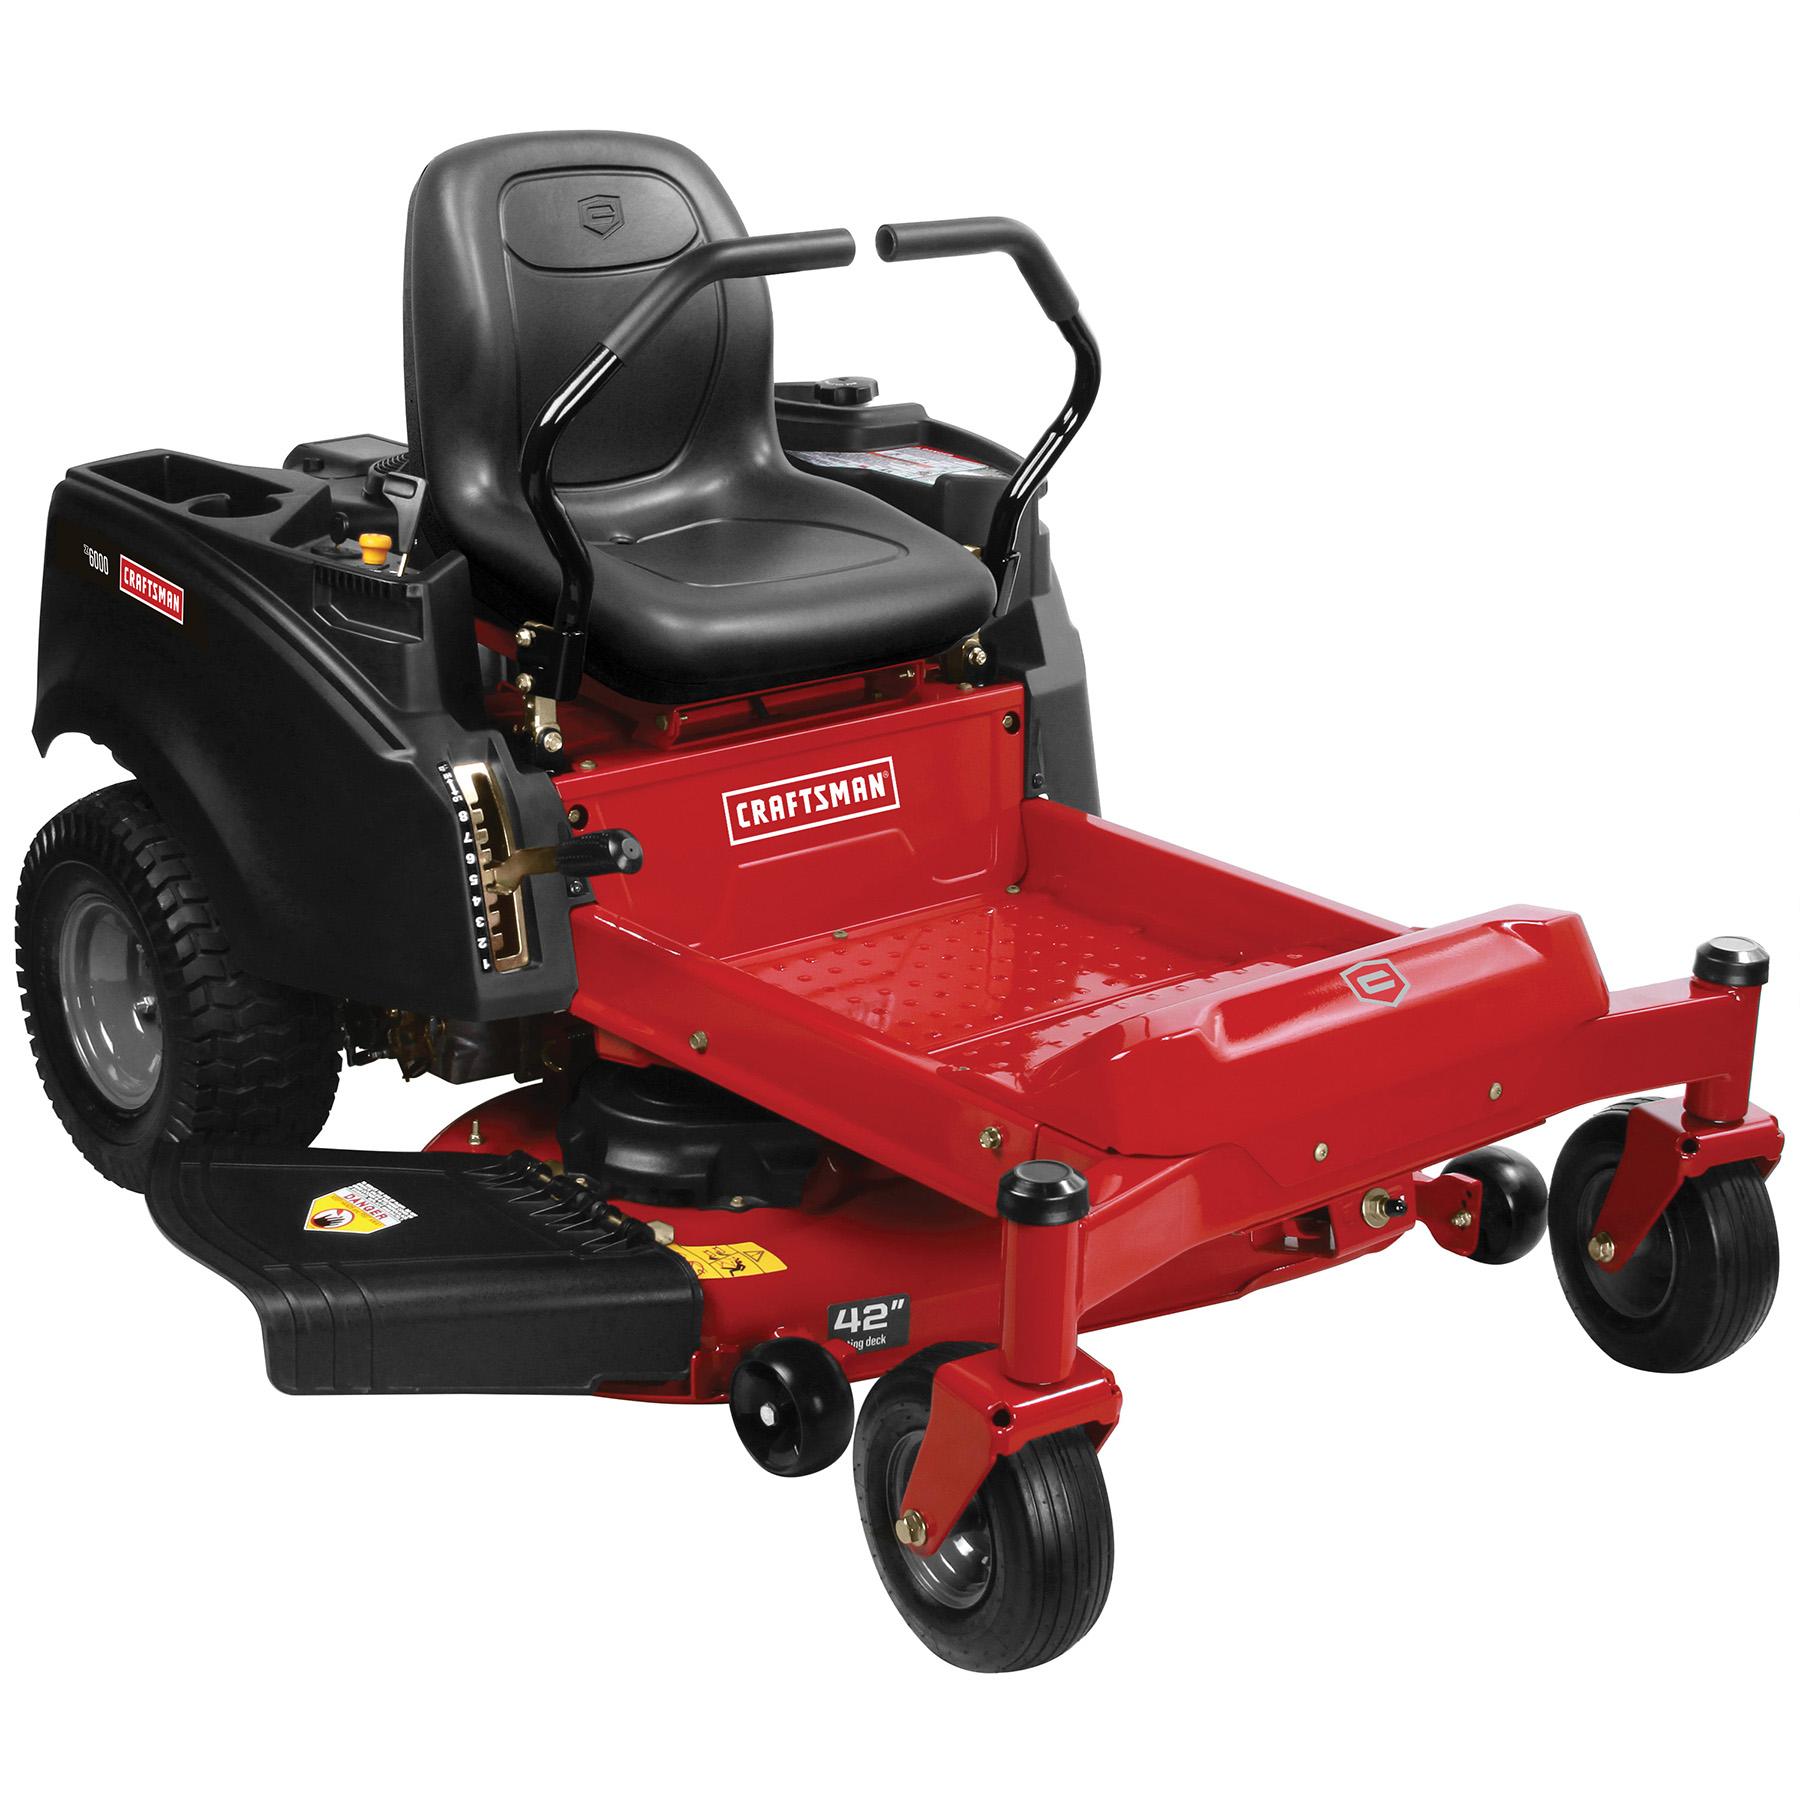 For Troy Bilt Garden Way Riding Mower Wiring Diagram Craftsman 20411 42 Quot 22 Hp V Twin Briggs Amp Stratton Zero